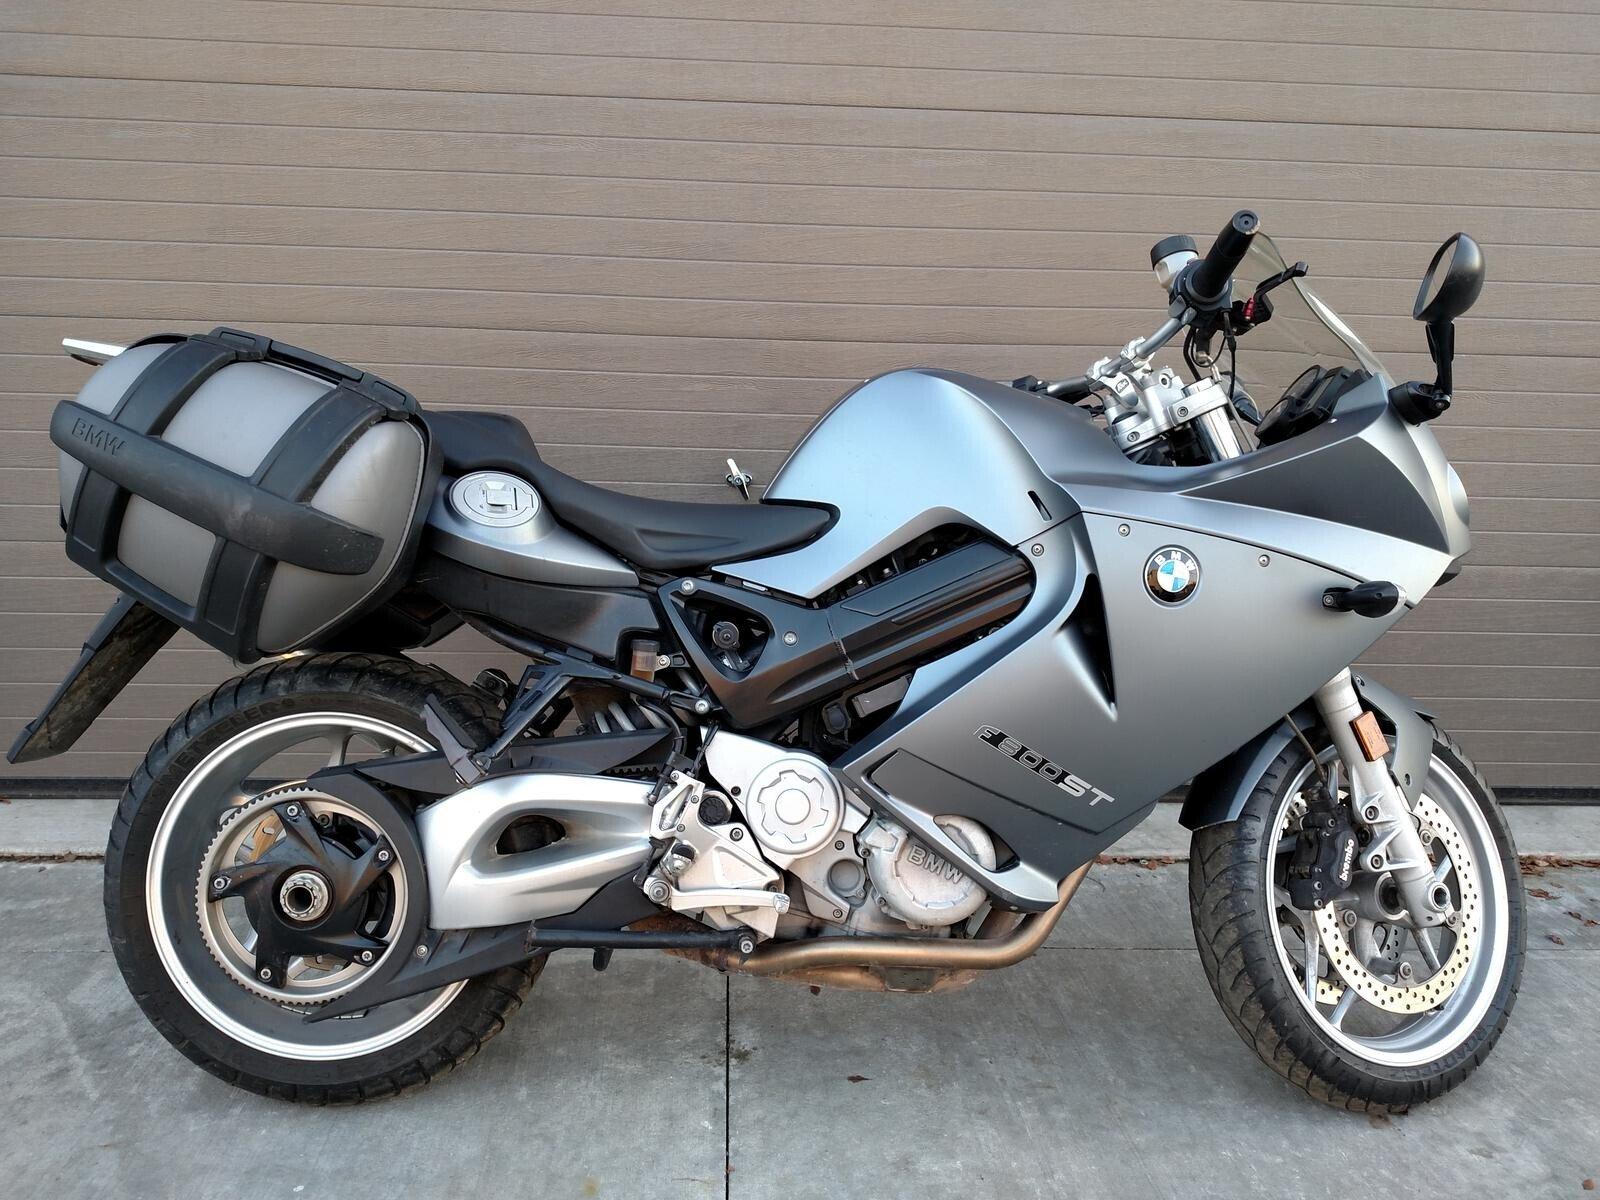 Rick Roush Honda Motorcycles >> BMWs for Sale - Autotrader Motorcycles